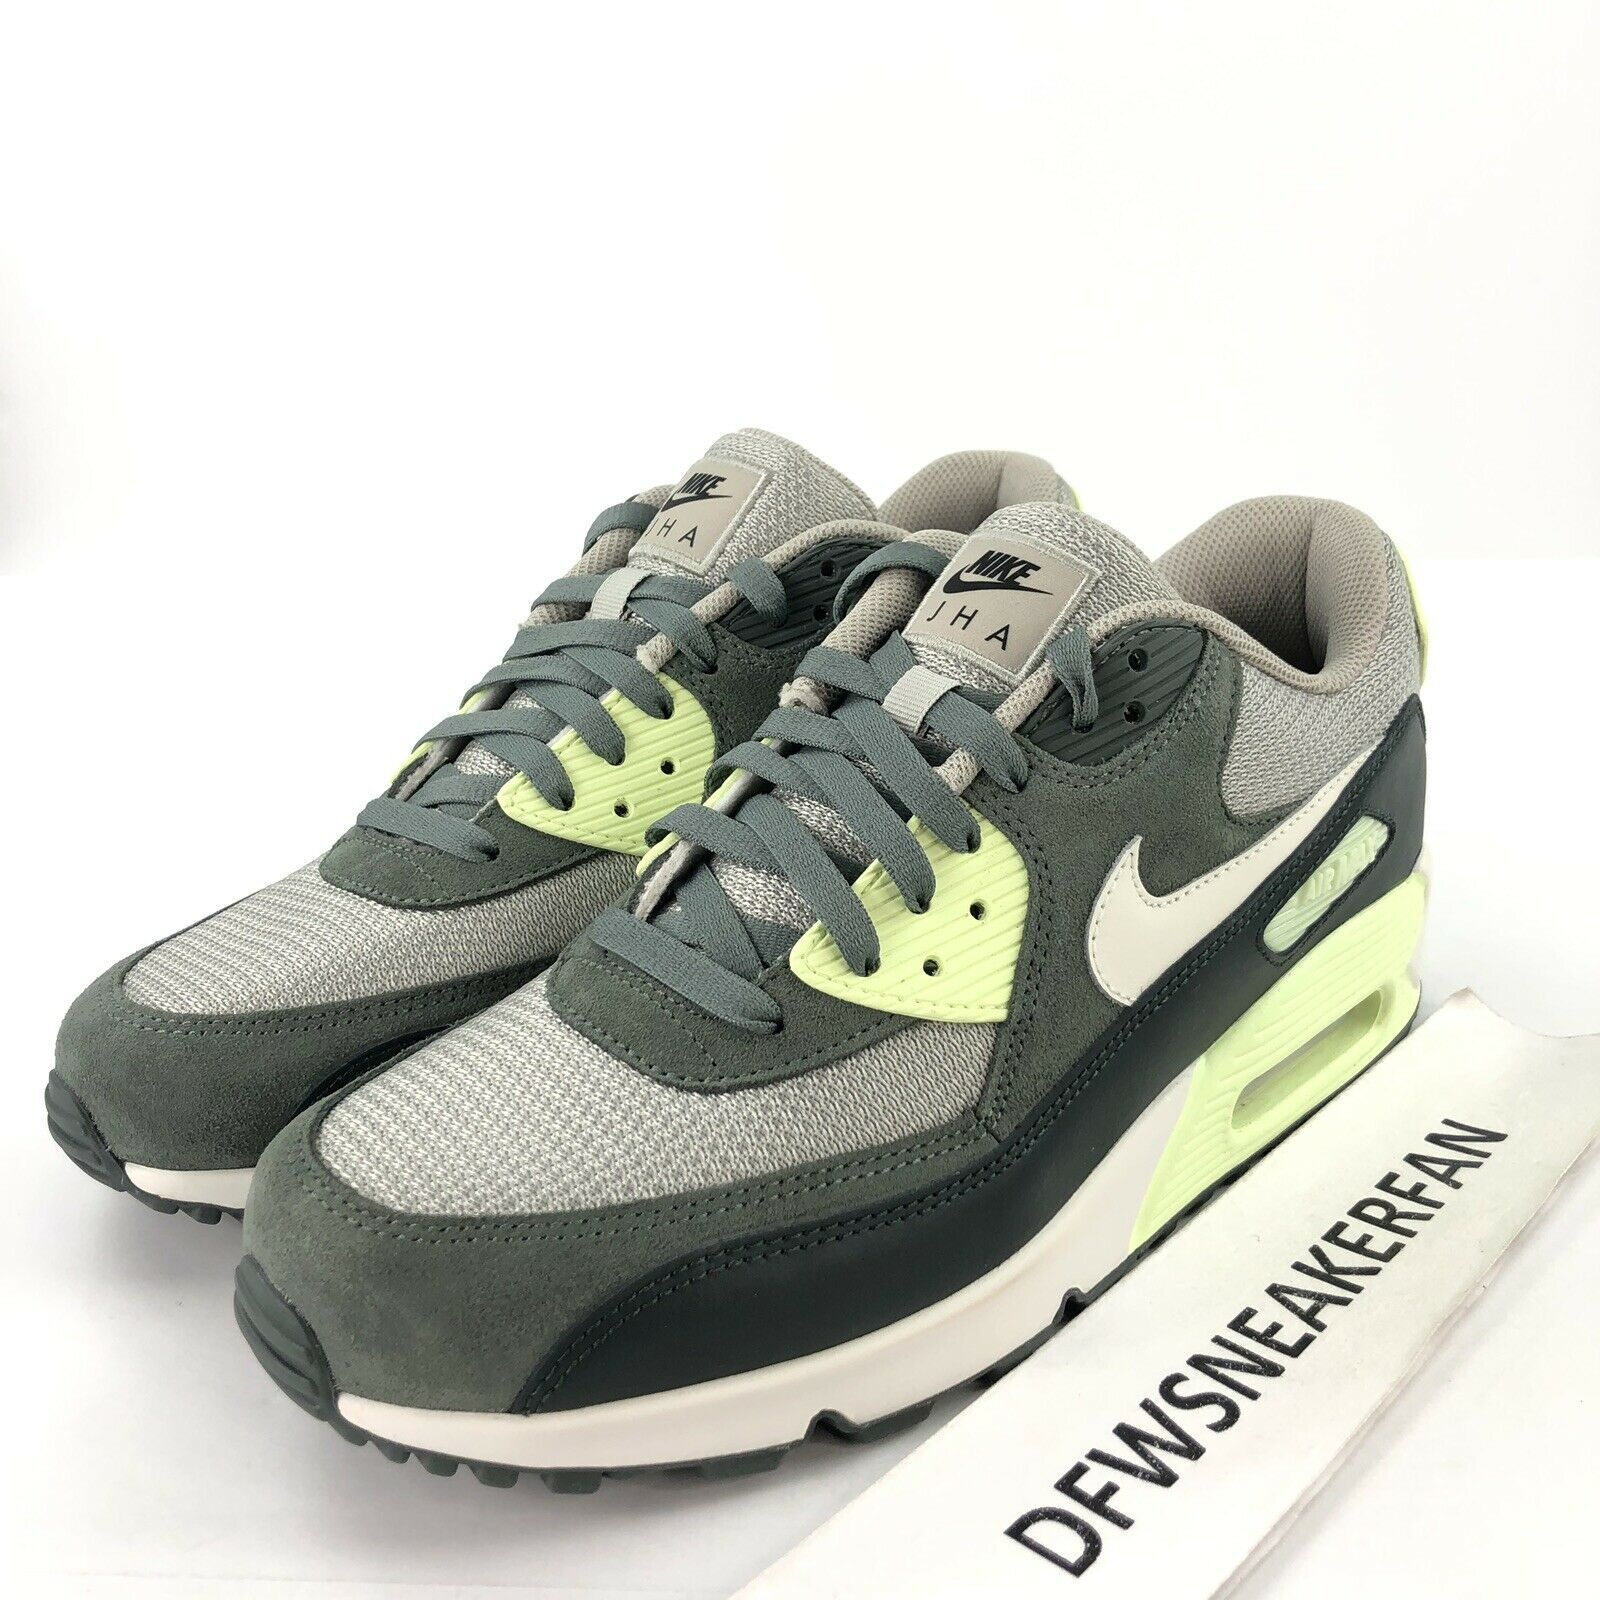 Nike Air Max 90 Premium iD Men's 10.5 Running shoes Green BQ8747-991 New